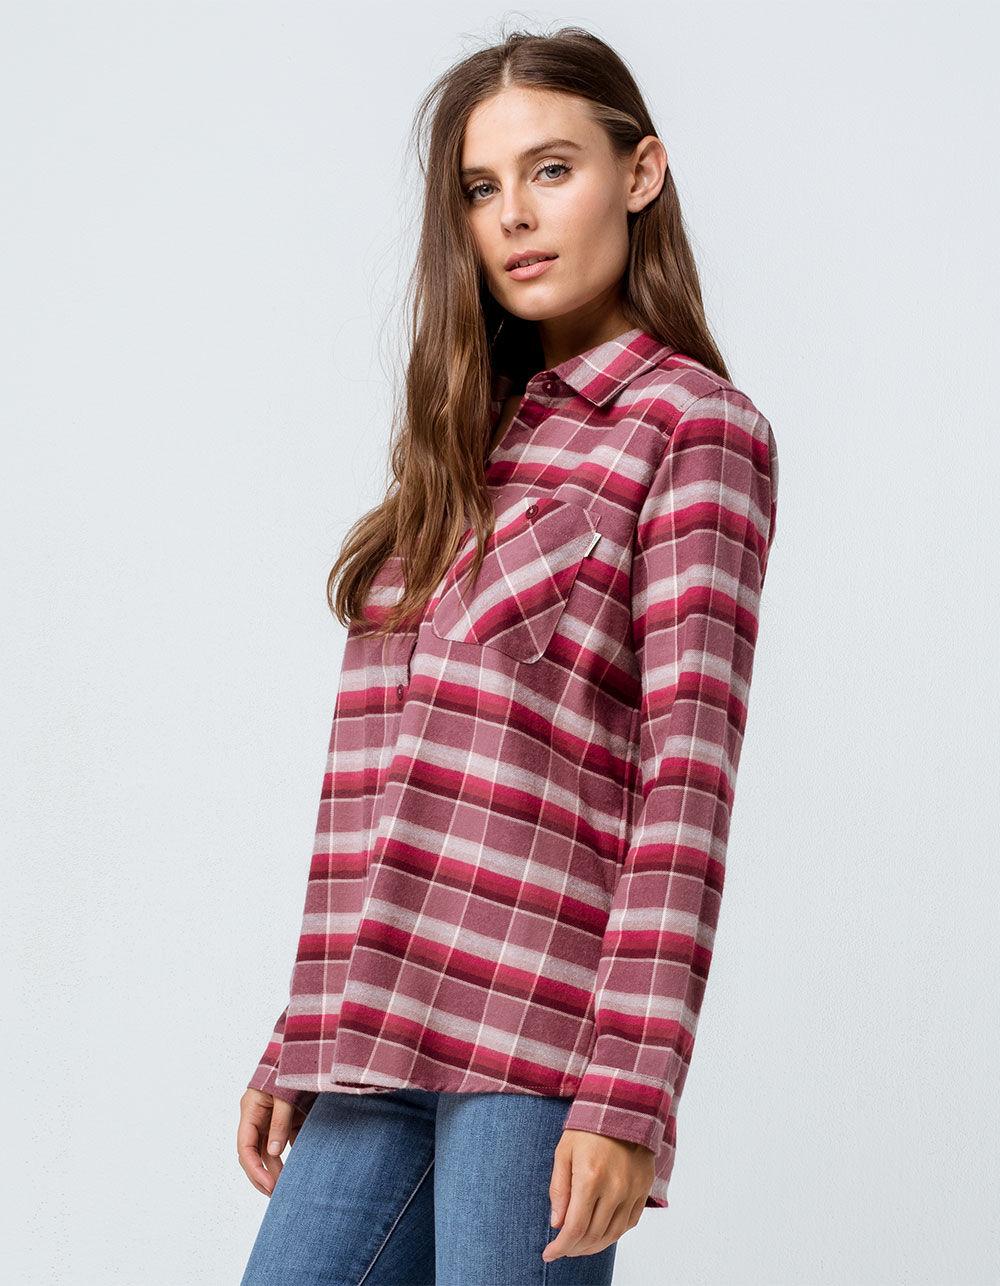 BURTON Grace Rose Flannel Shirt